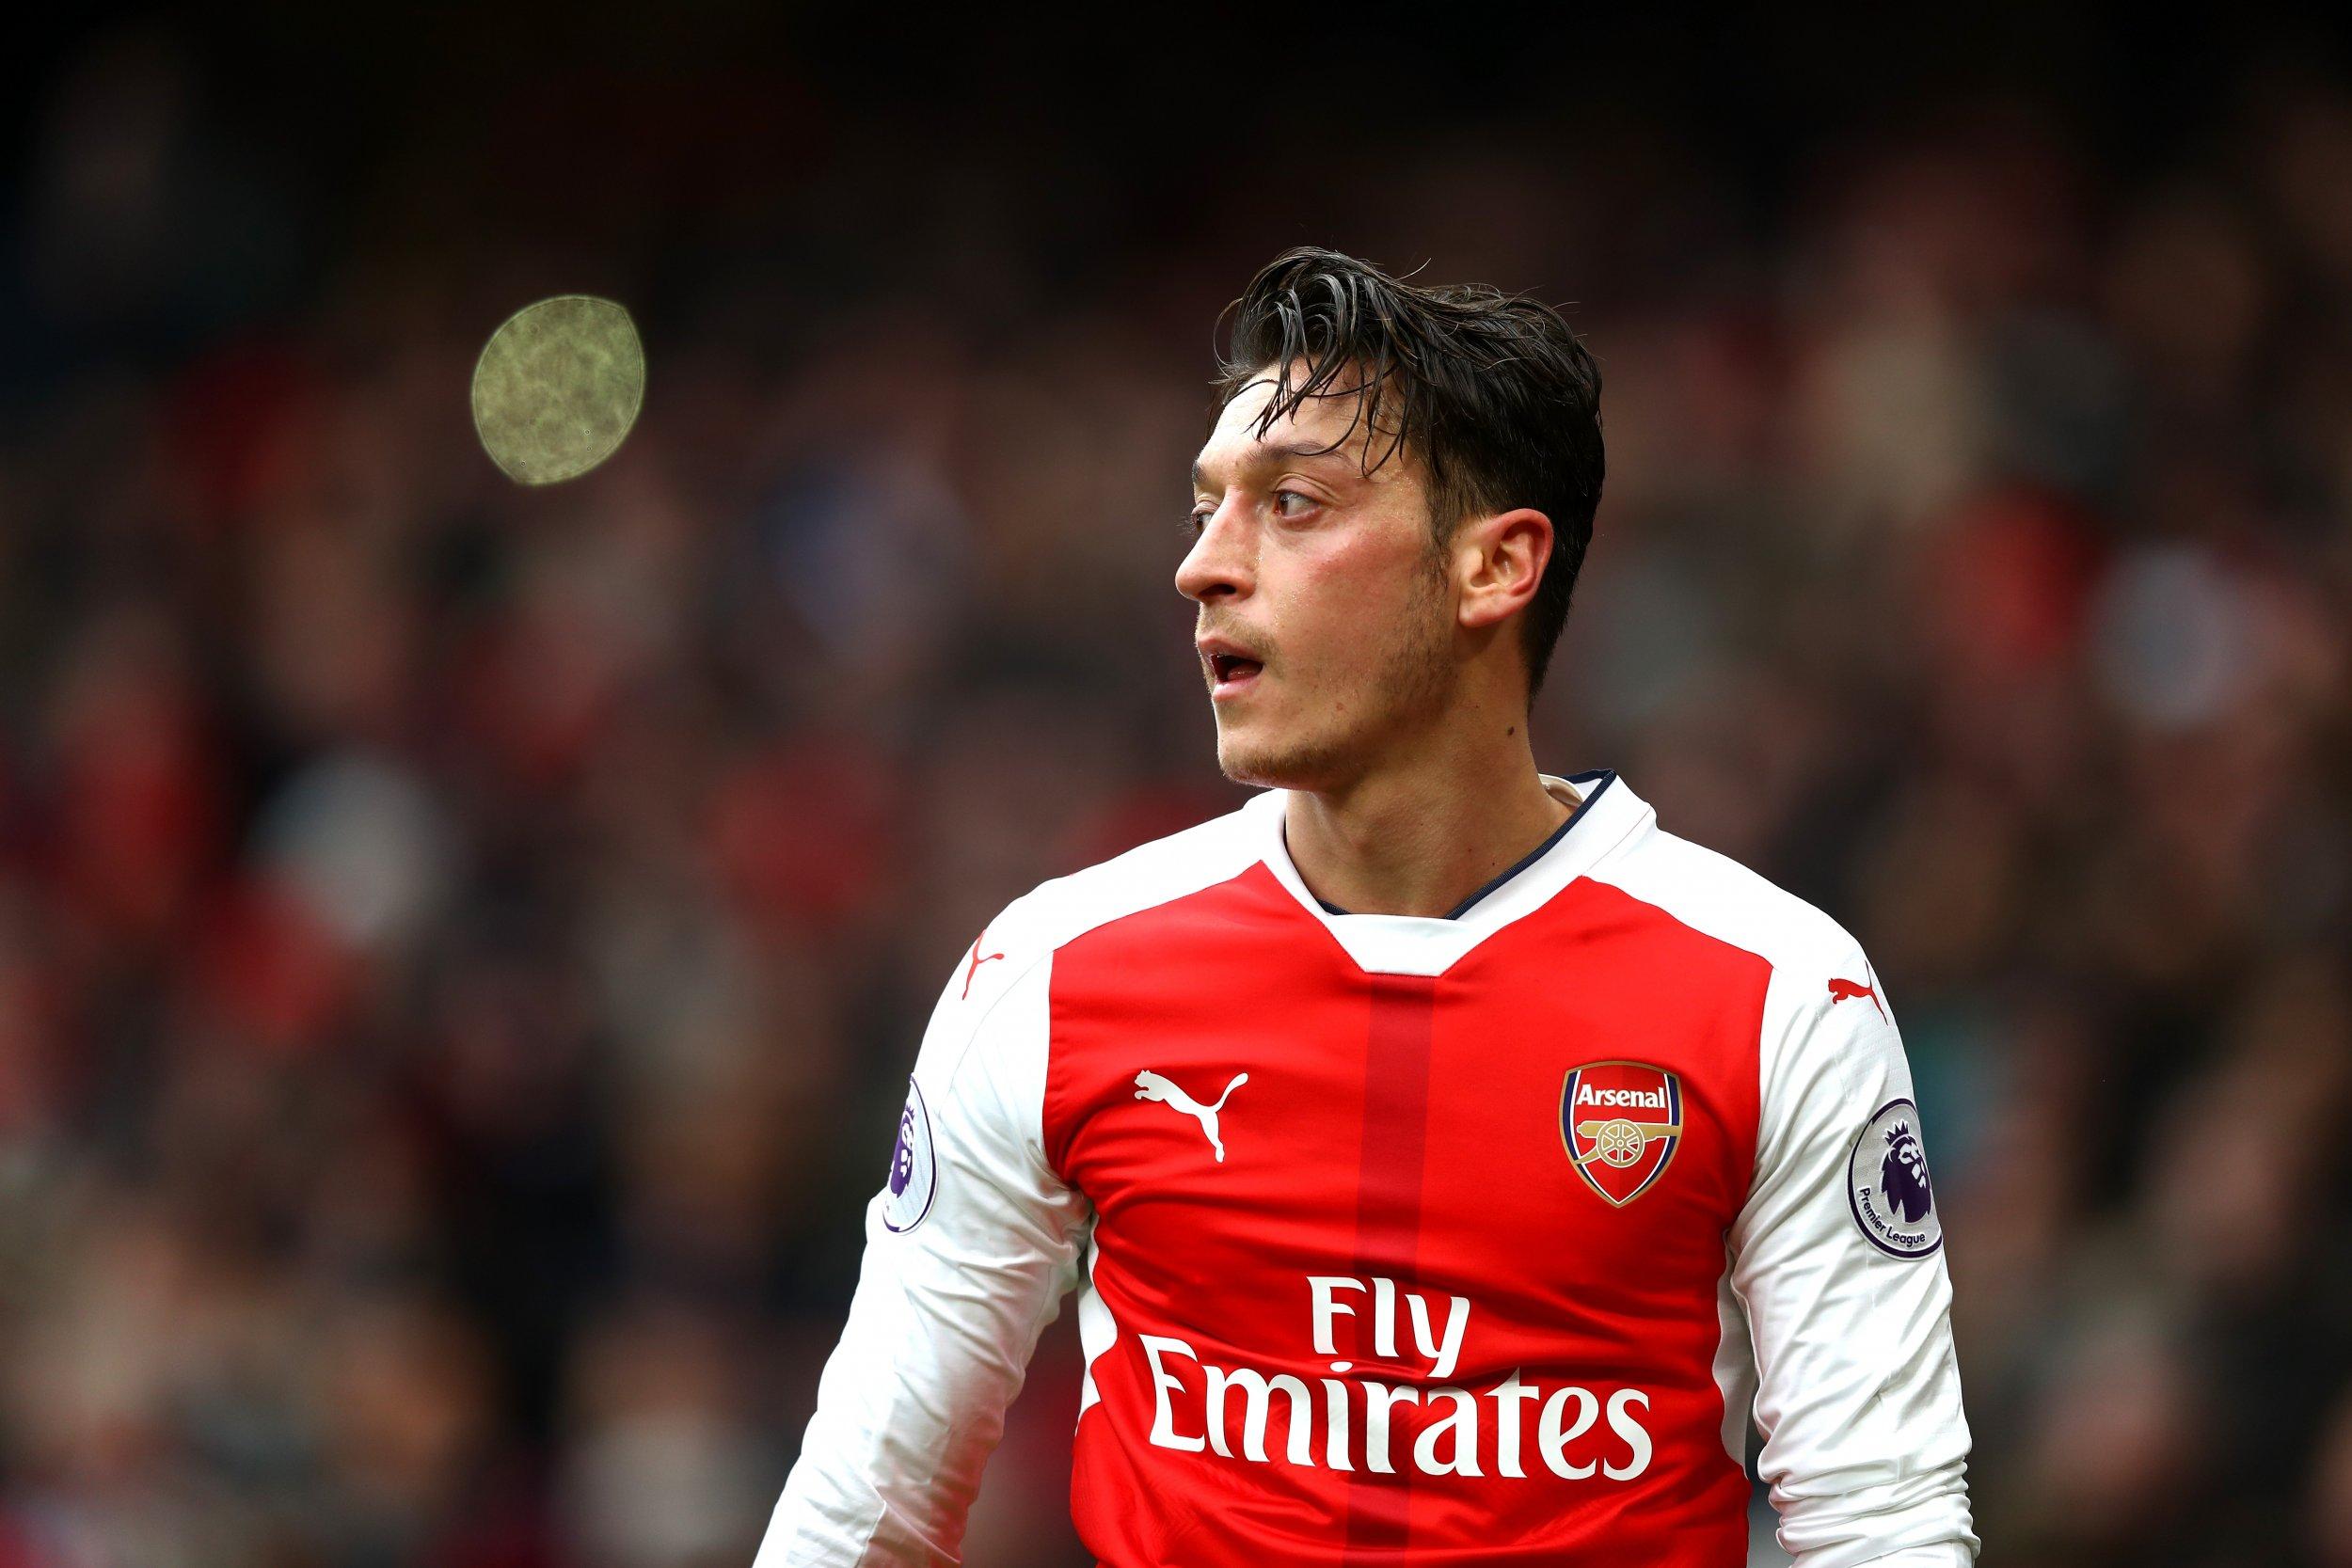 buy online c6ca2 9c53d Arsene Wenger Identifies Problem in Arsenal's Star Player